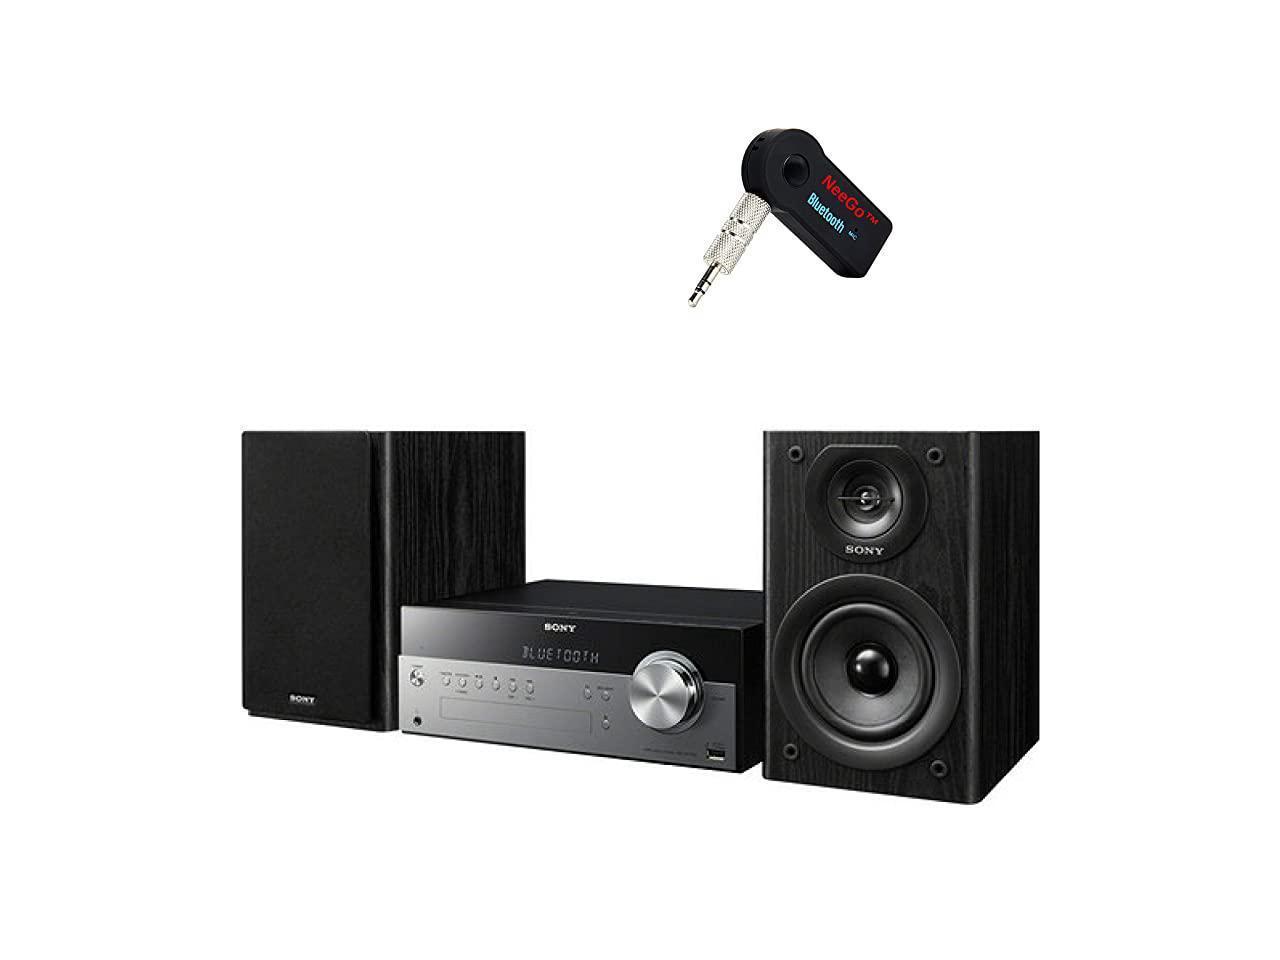 2 2-Way Bluetooth Bass Reflex Speakers NeeGo Bluetooth Receiver; Sony Bluetooth Micro Music System Bundle USB Input Piece Set Includes Micro Hi-fi Shelf System with Single Disc Cd Player